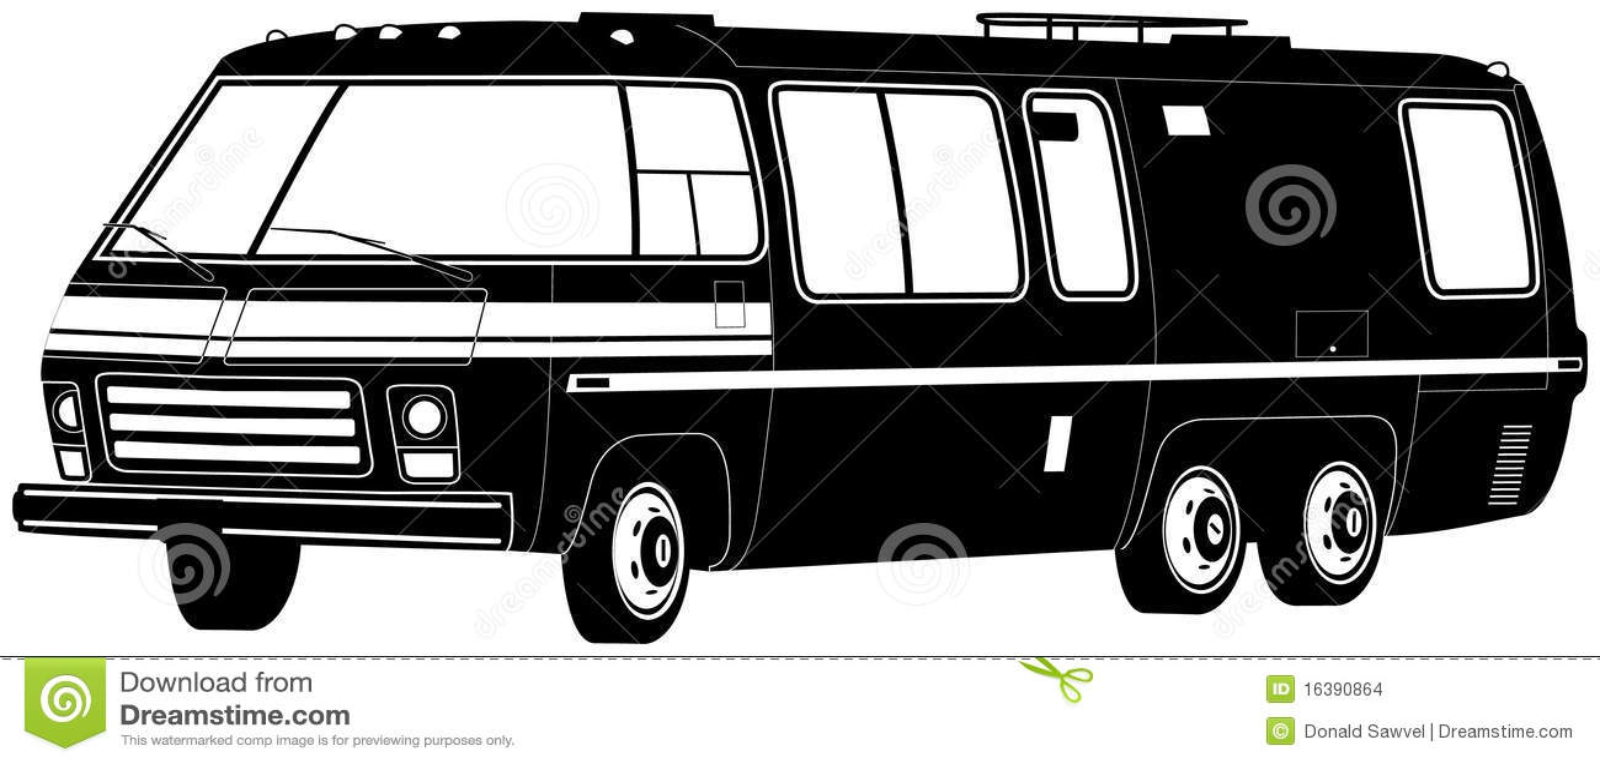 Motorhome Illustration Stock Images - Image: 16390864